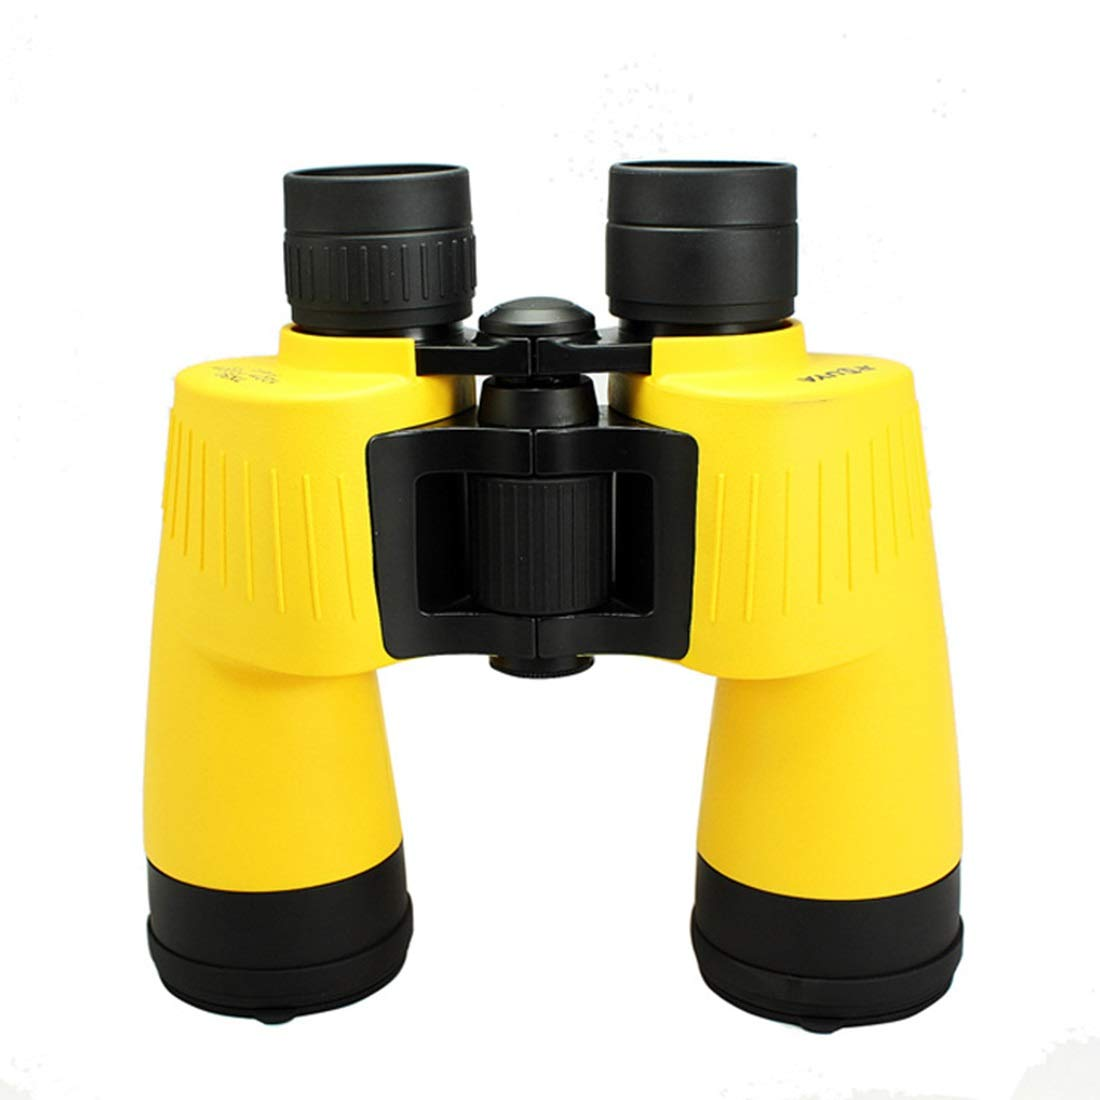 JPAKIOS 子供と大人のための10x50コンパクトHD双眼鏡、バードウォッチング用折り畳み式望遠鏡、屋外キャンプ、男の子、女の子のための最優秀ギフト (Color : イエロー)  イエロー B07PLQFCLV